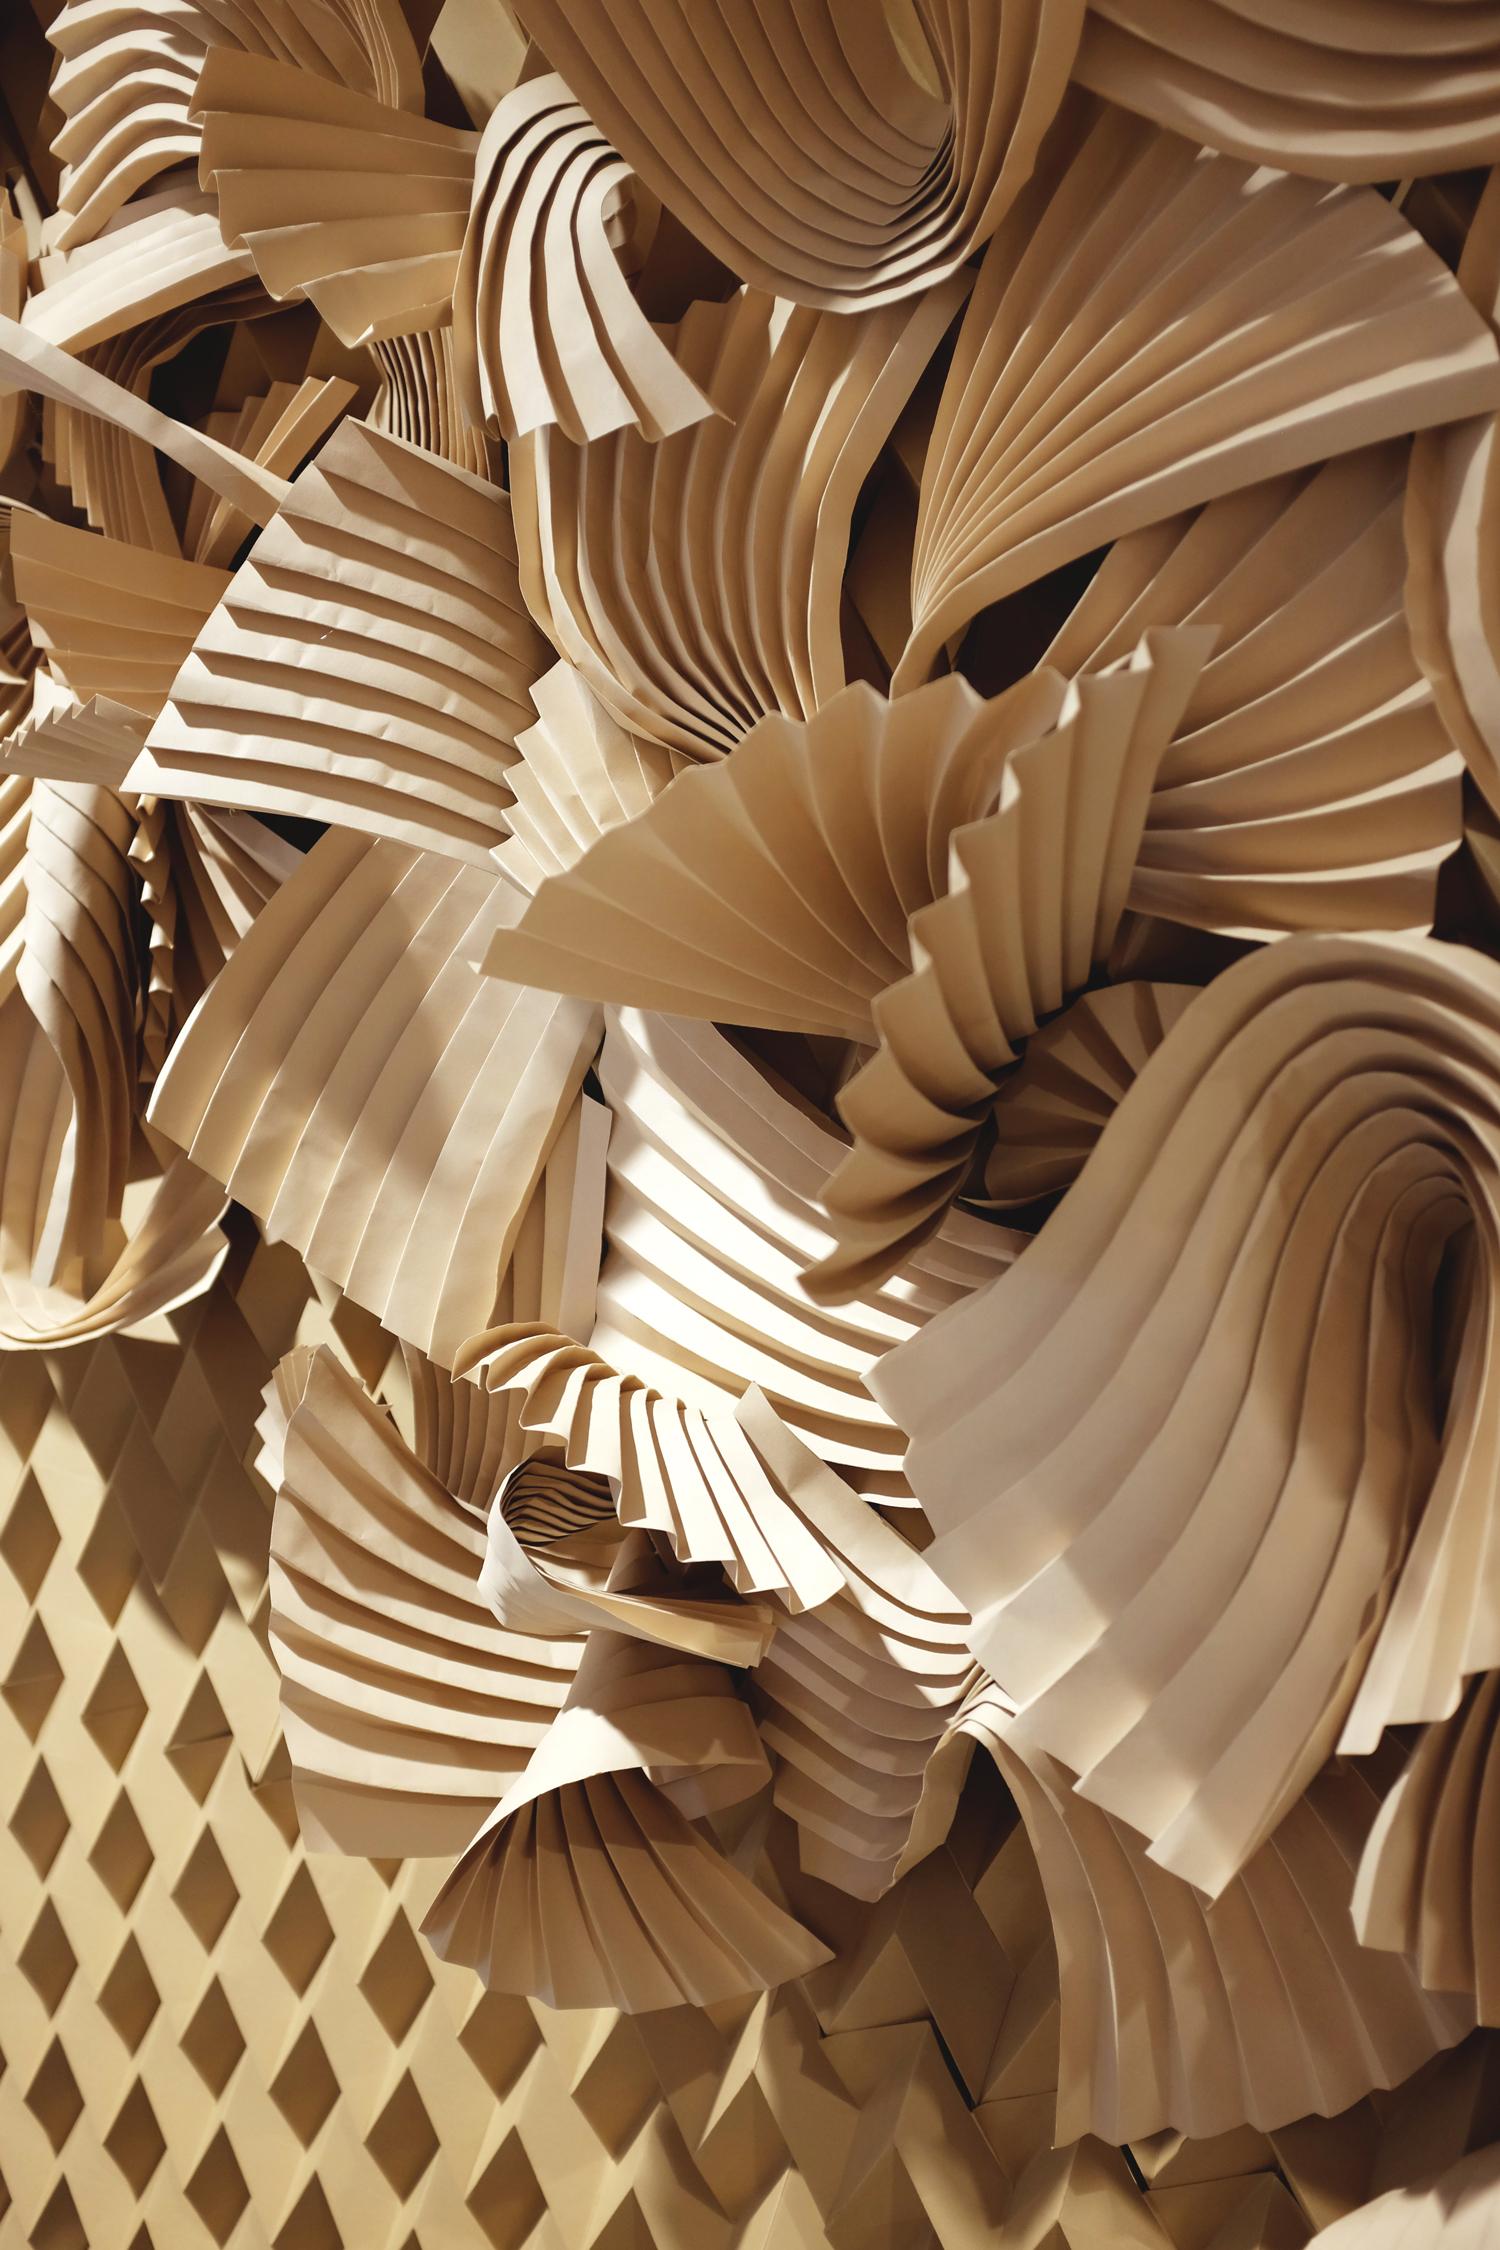 miss-cloudy-folding-paper-art-dune-knot-on-my-planet-holt-renfrew-doutzen-mural-sable-colorplan-pauline-loctin-18.jpg